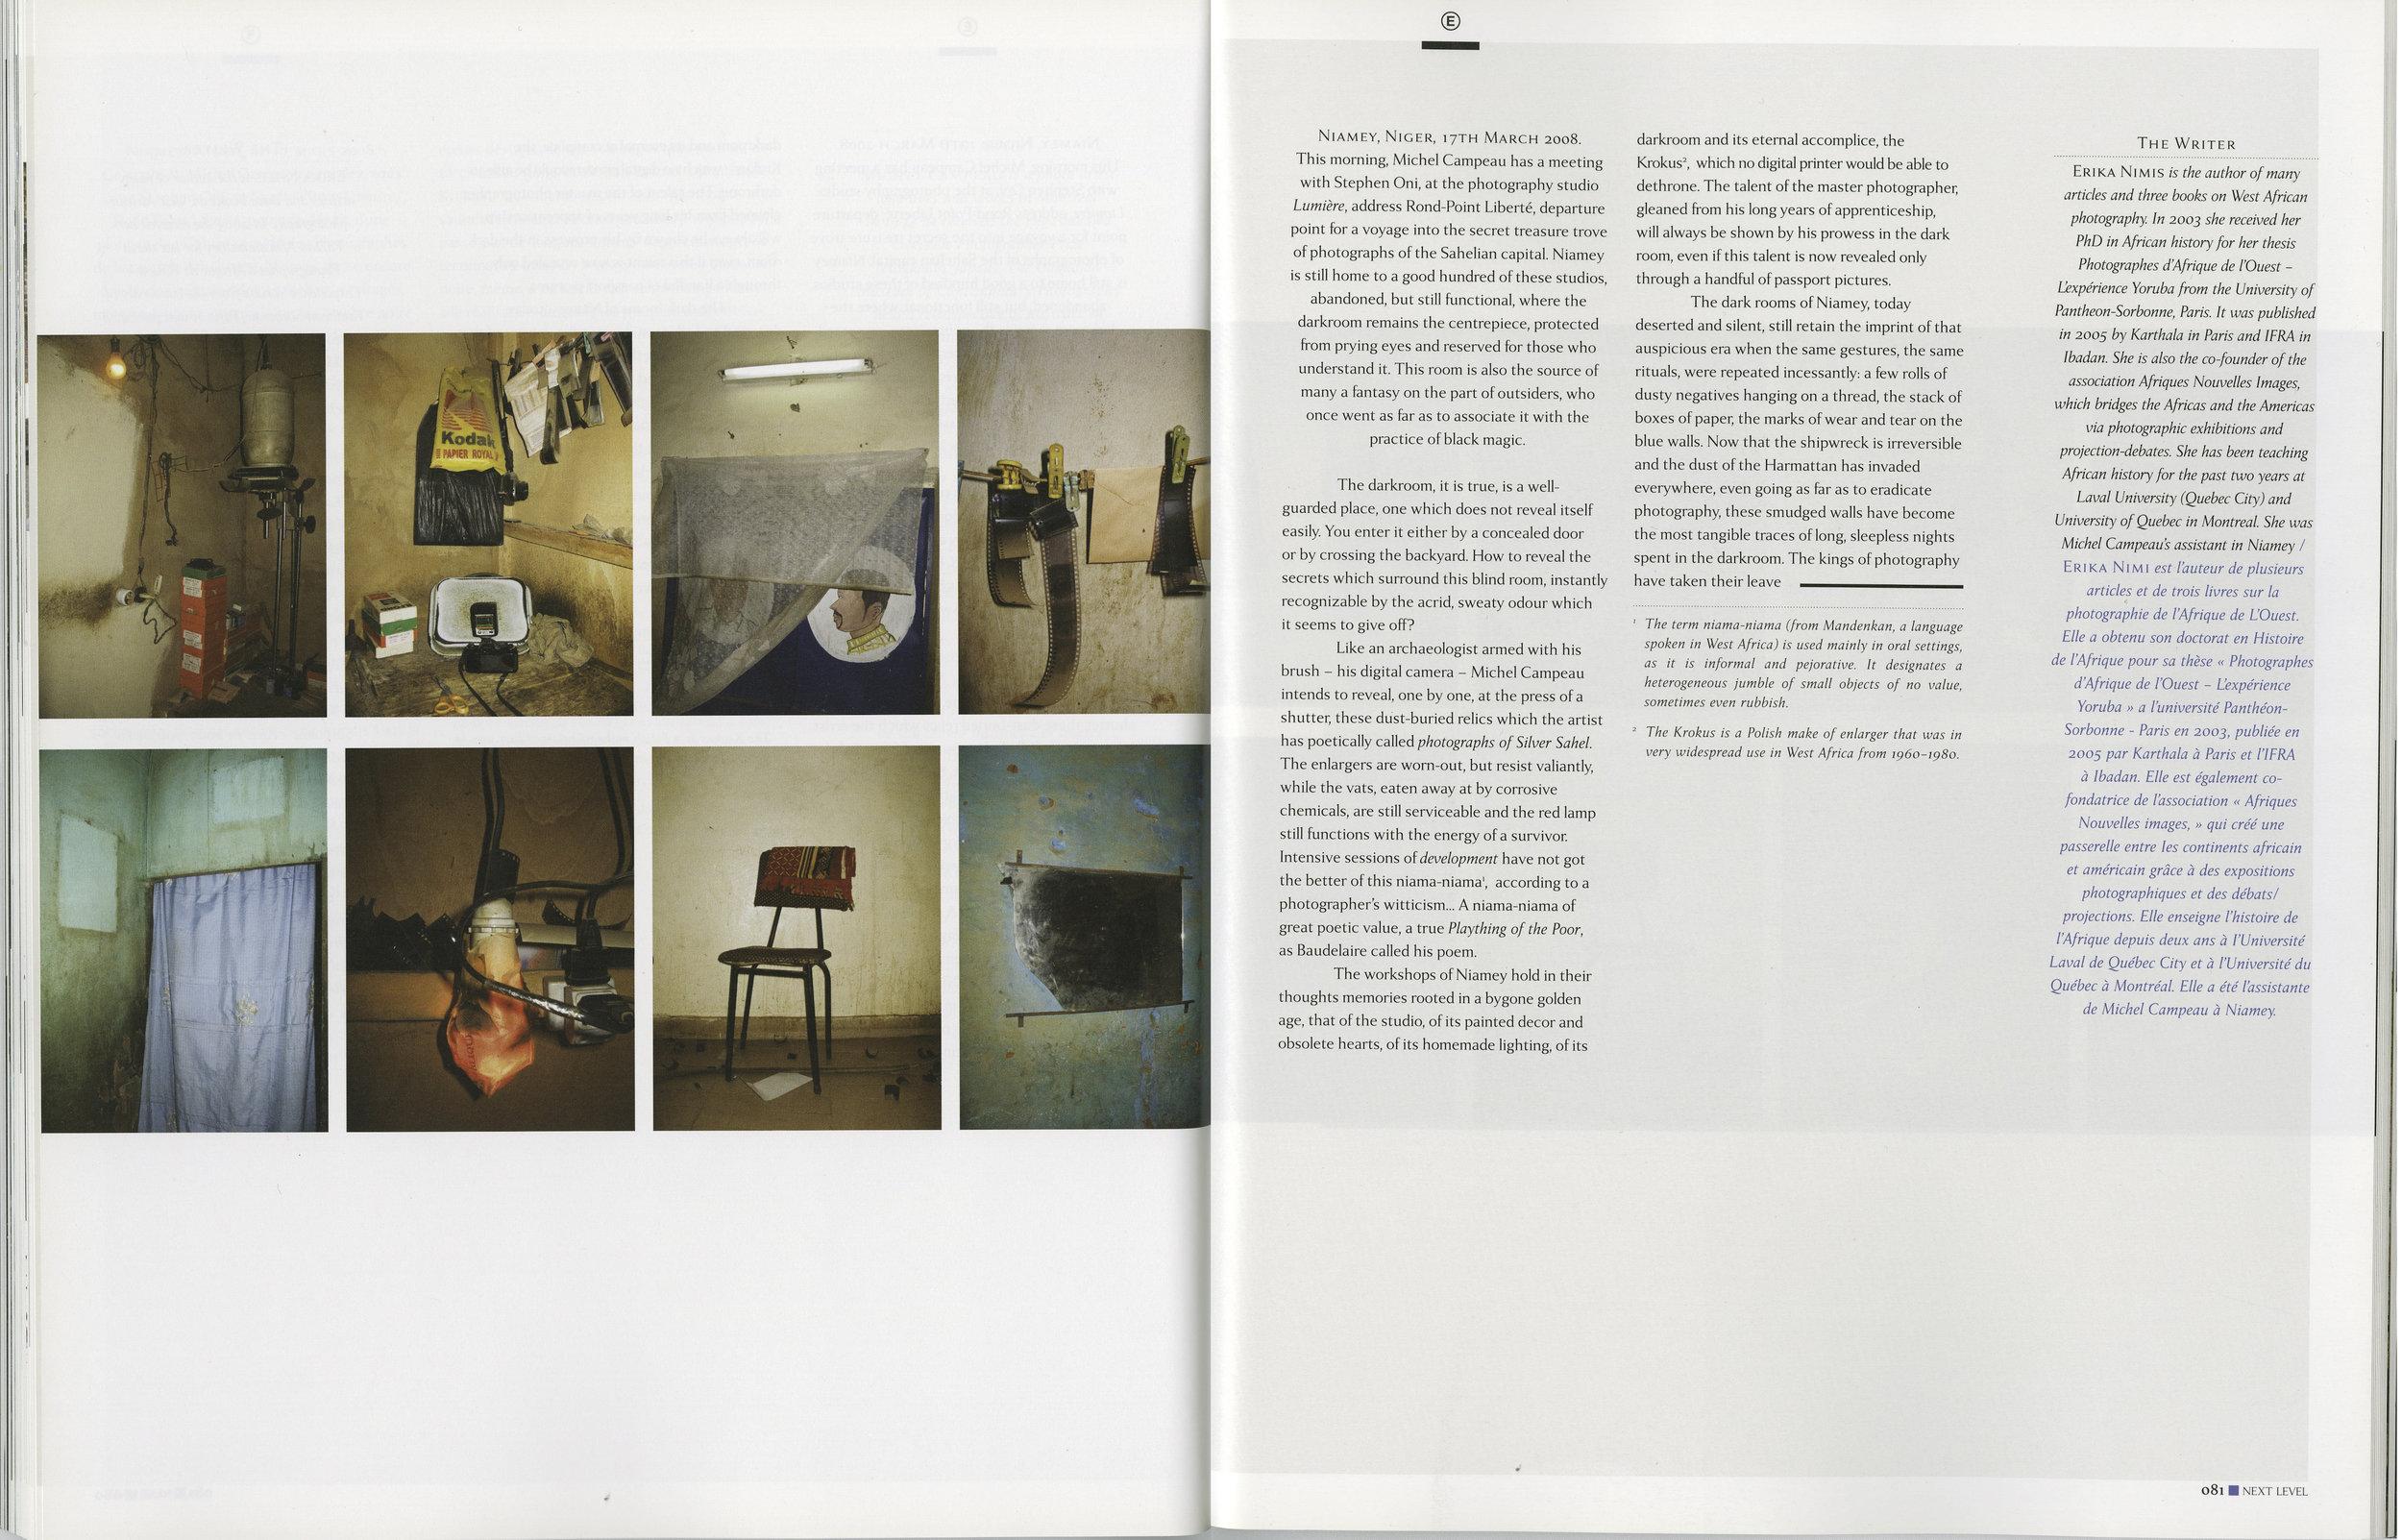 Studios and Darkrooms in Niamey , Niger Érika Nimis, Next Level Magazine, London, UK, July 2009